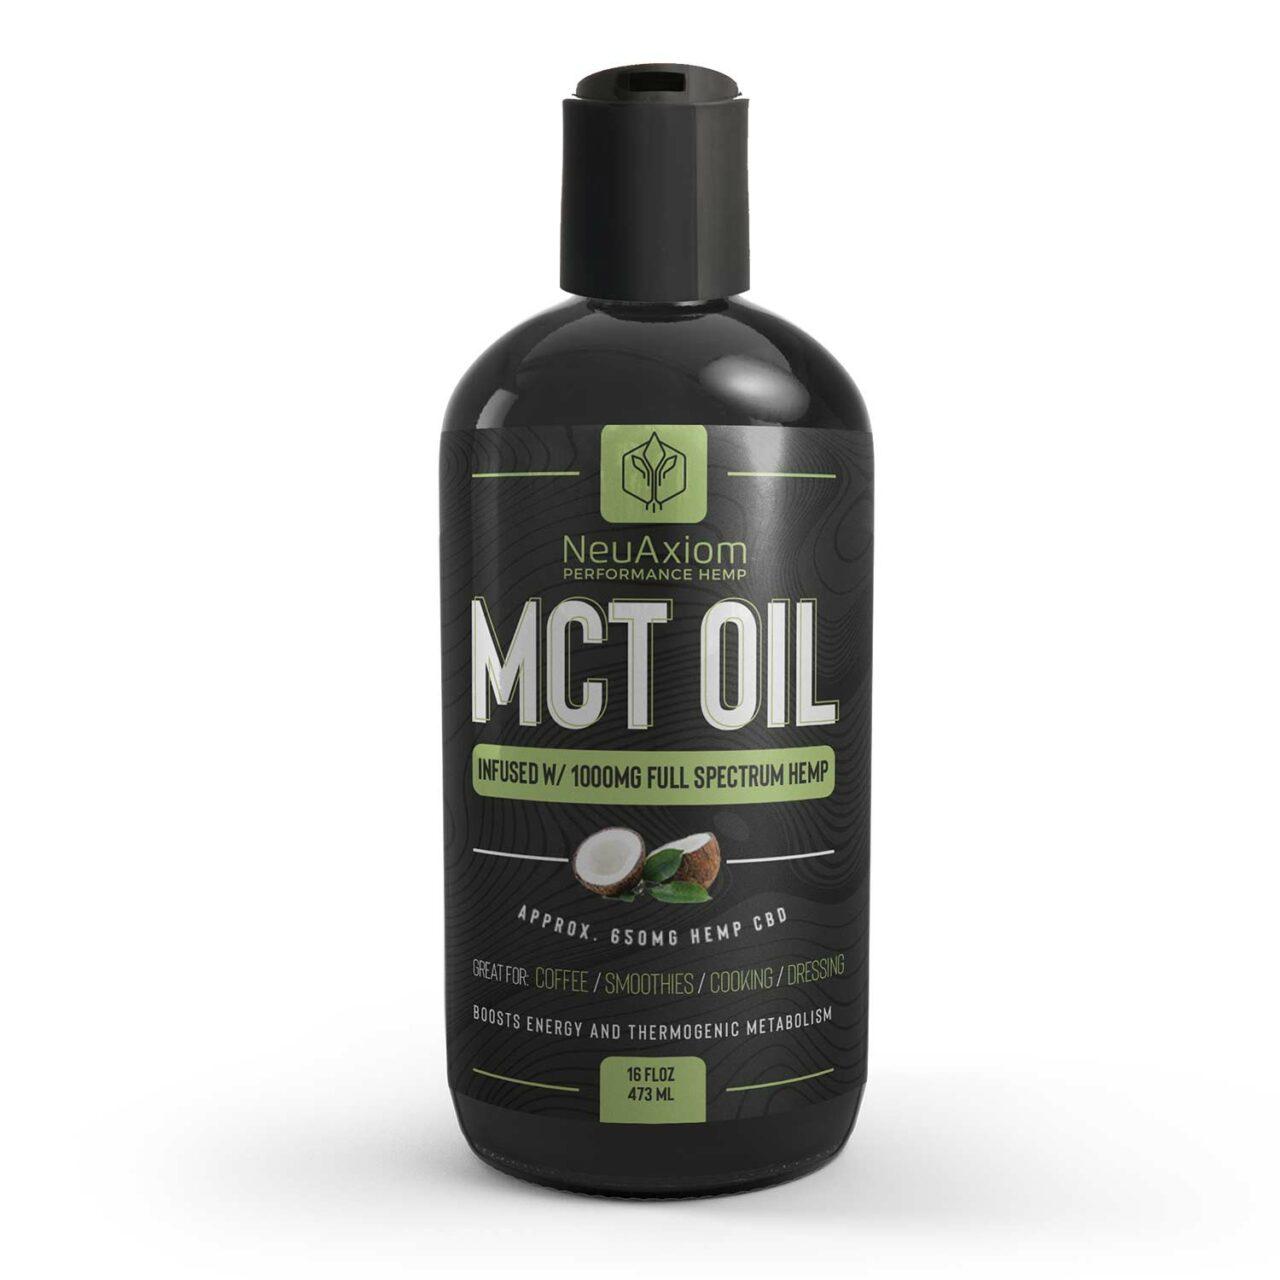 neuaxiom-mct-oil-coconut-16oz-1000mg-of-cbd